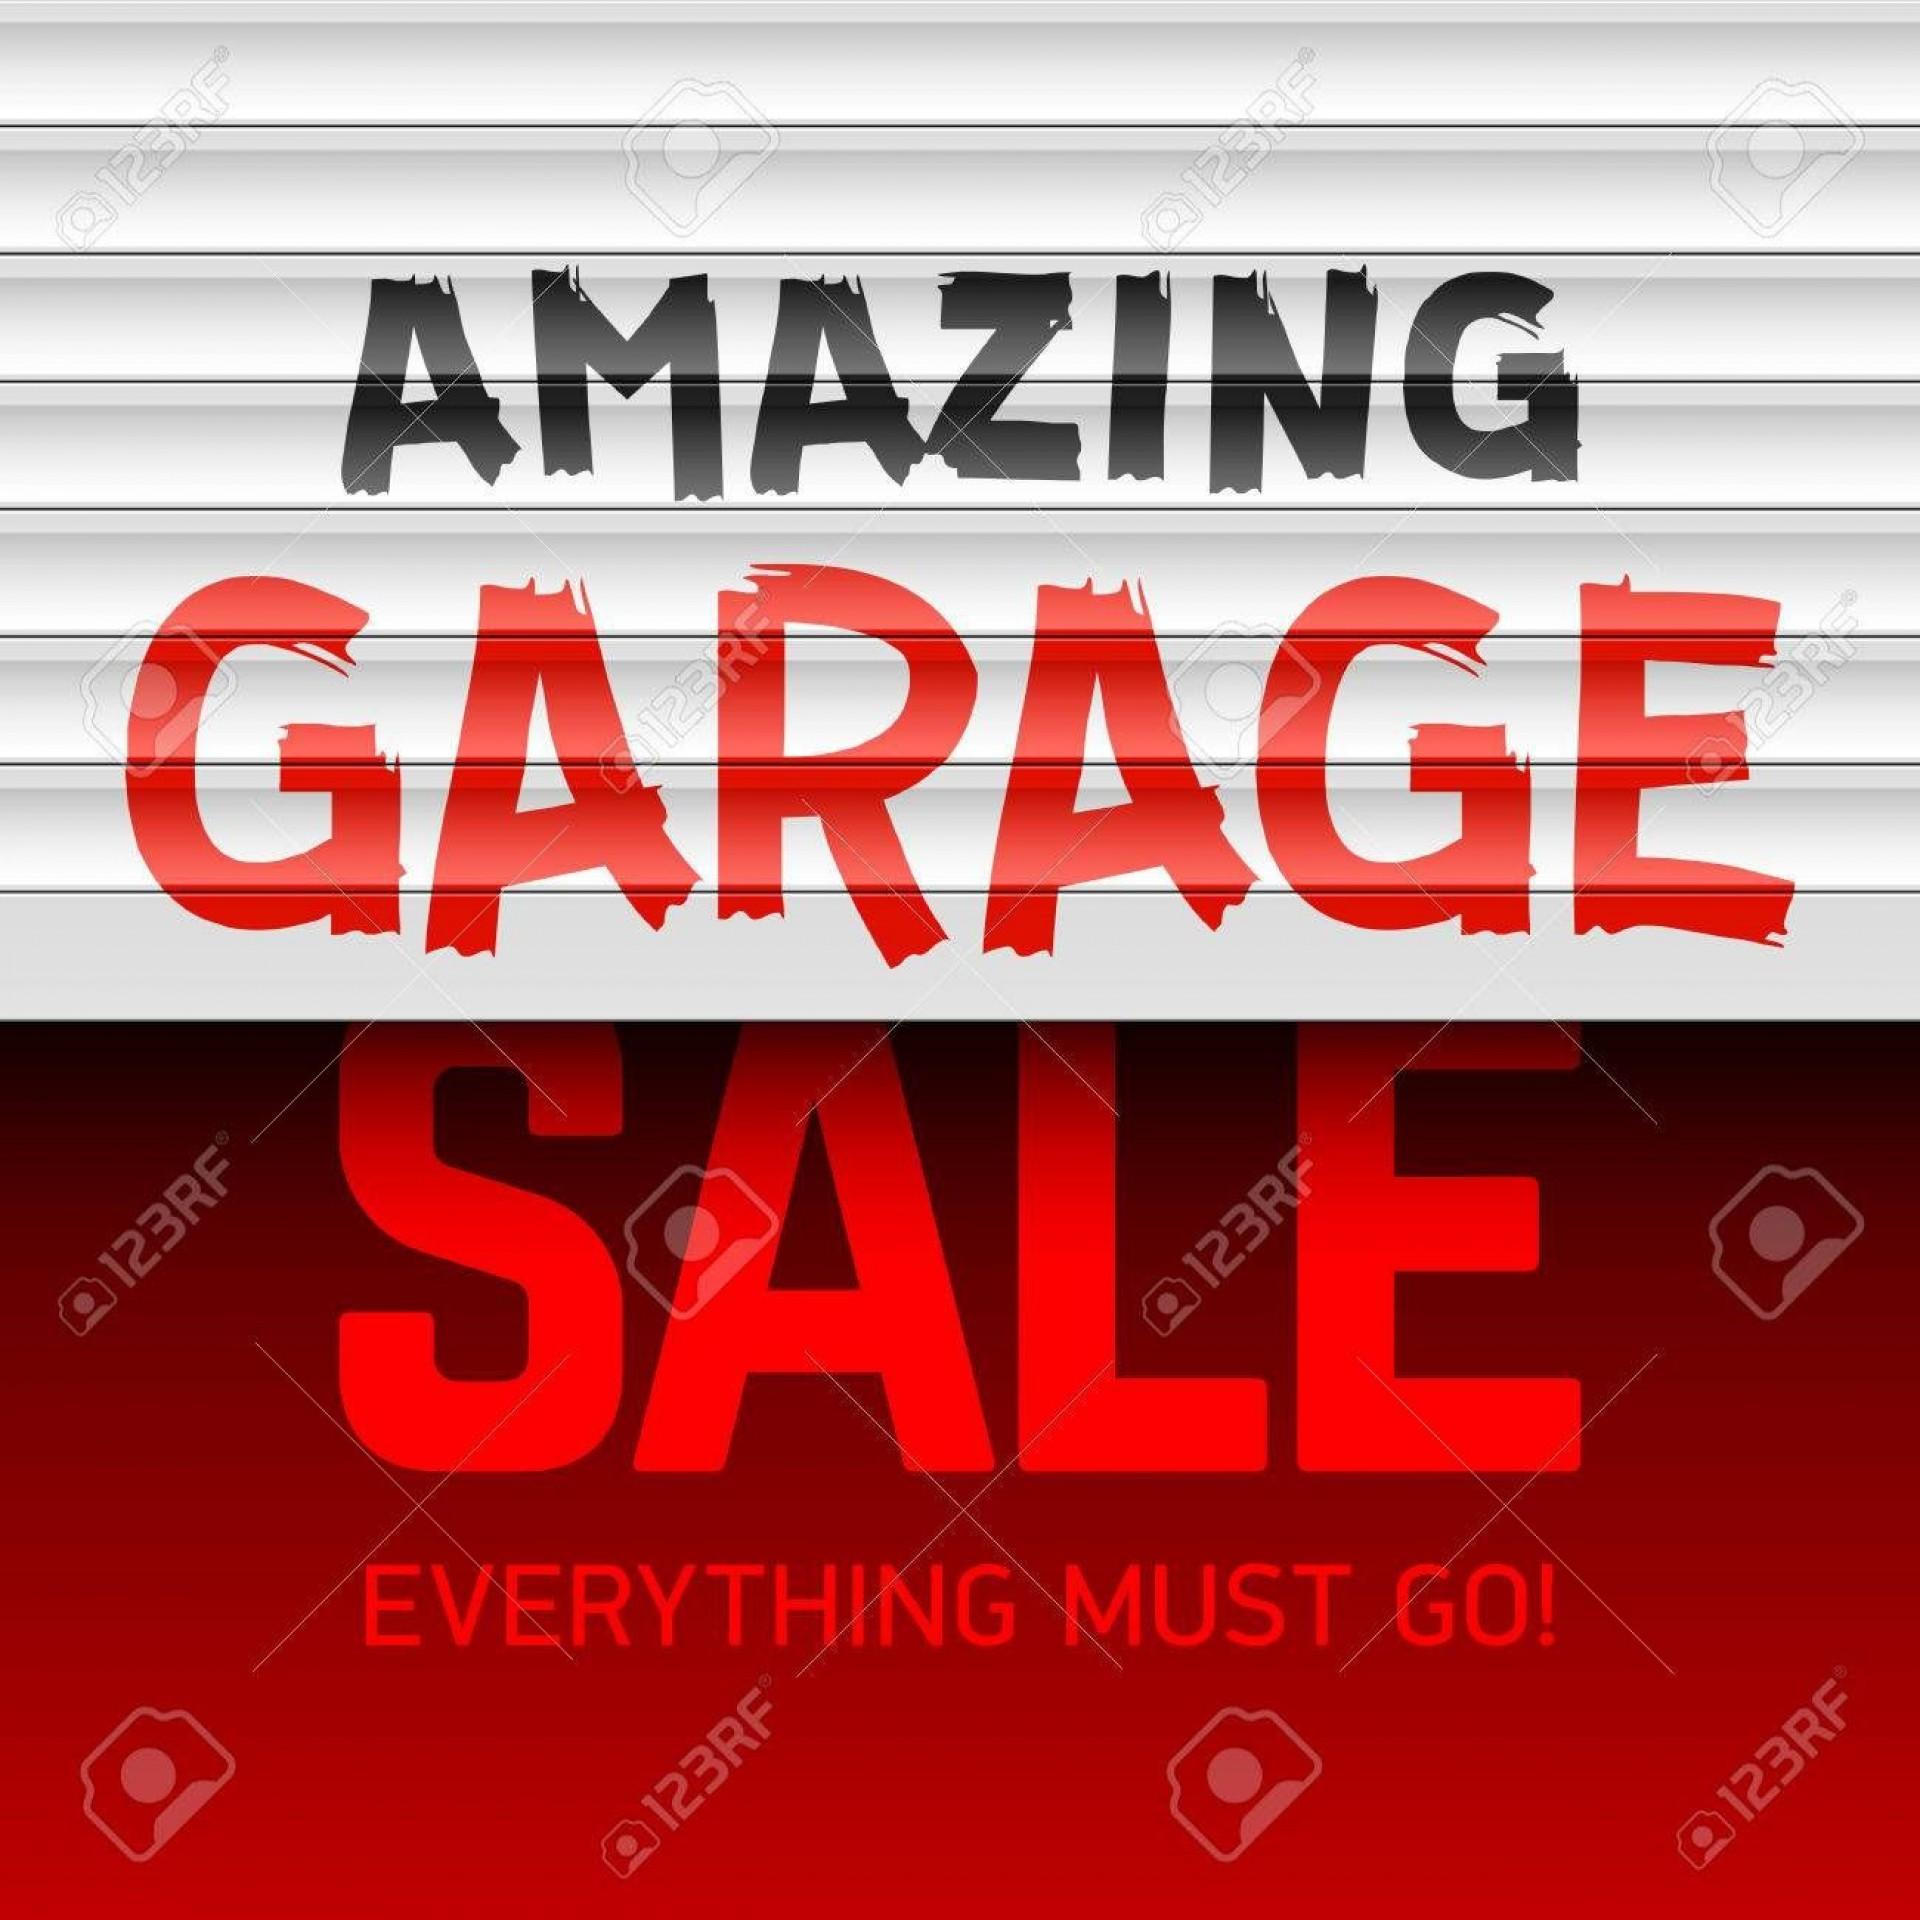 001 Wonderful Garage Sale Sign Template Example  Free Flyer Microsoft Word Yard1920